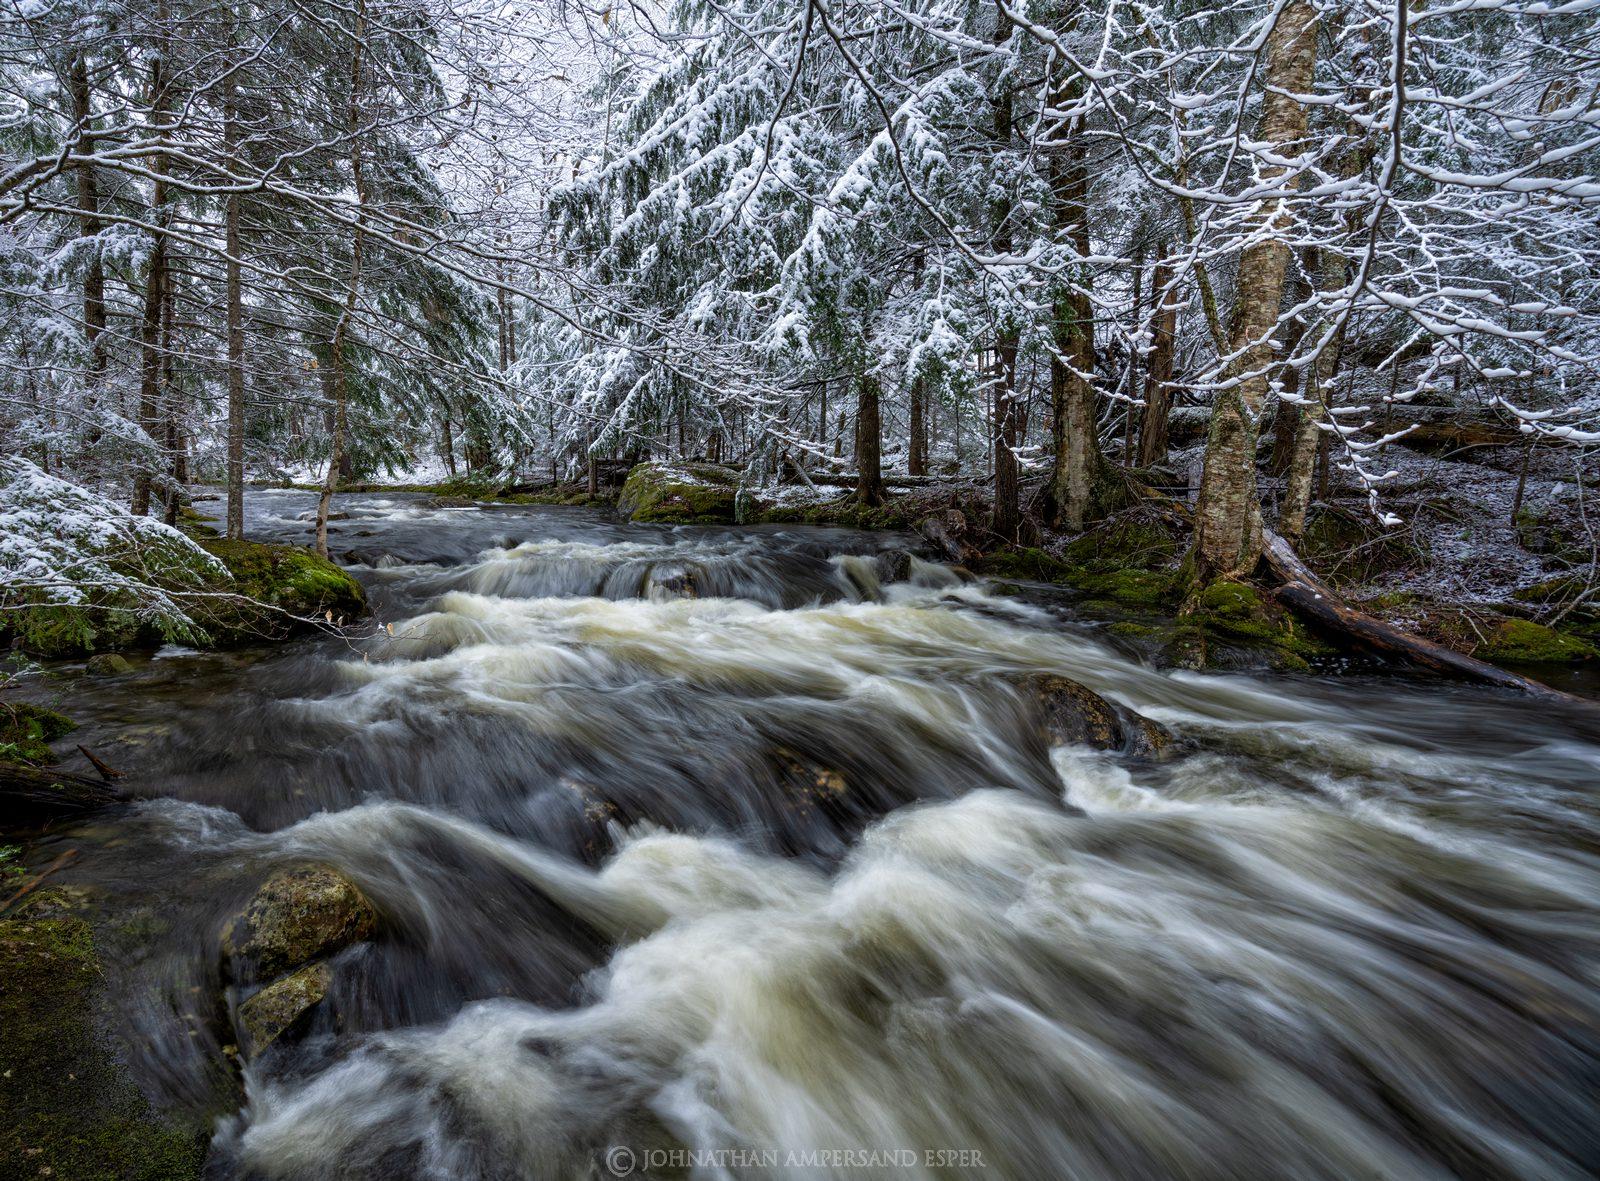 Owens Pond,Owens Pond outlet,stream,snow,spring snowfall,spring,snowfall,Wilmington Notch,May,2021,